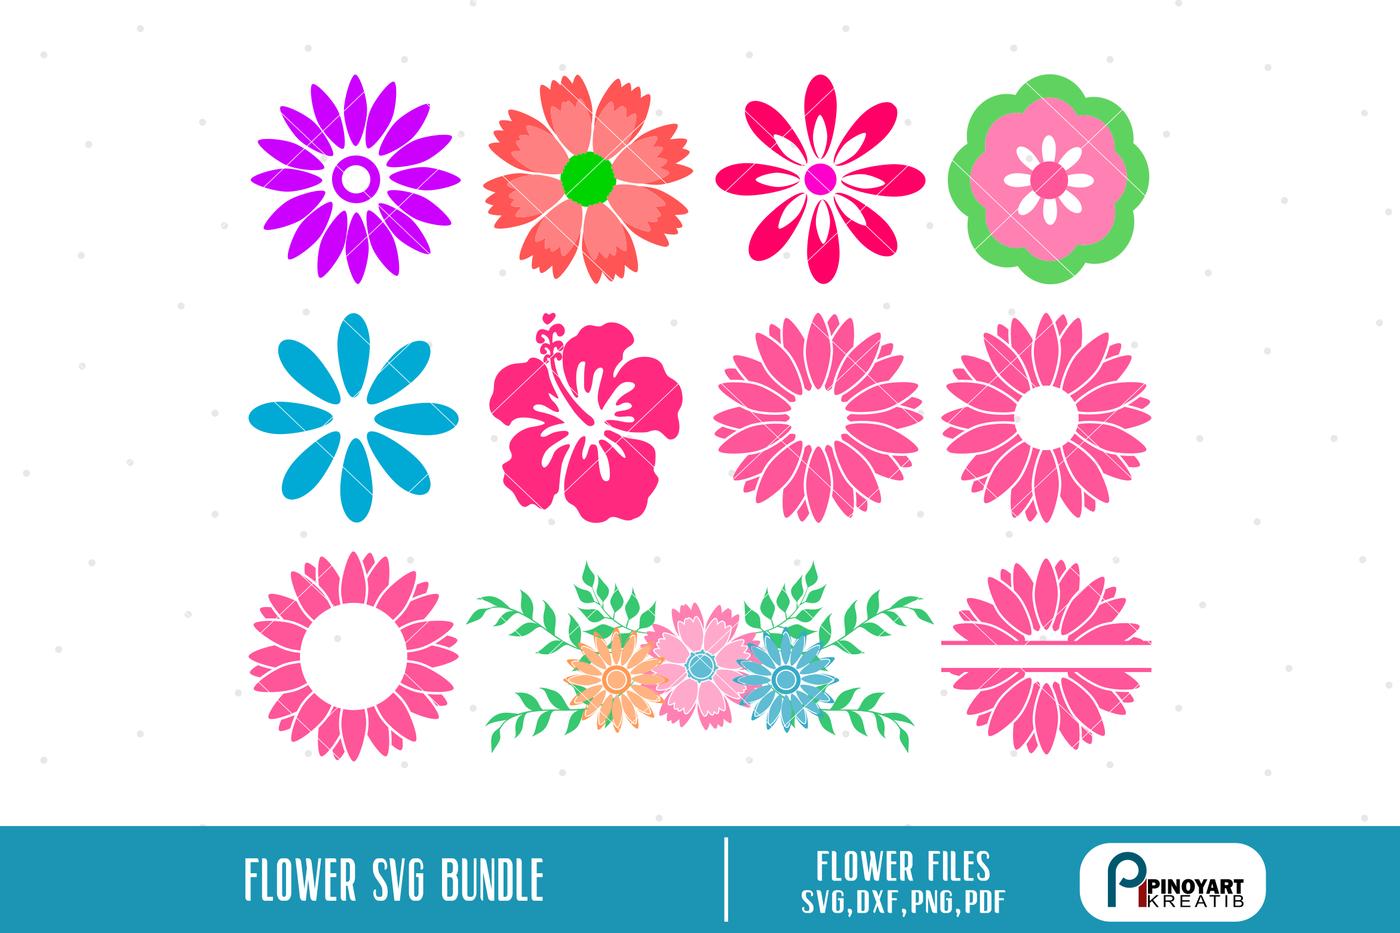 Download flower svg,flowers svg,flower svg,flower svg for cricut ...